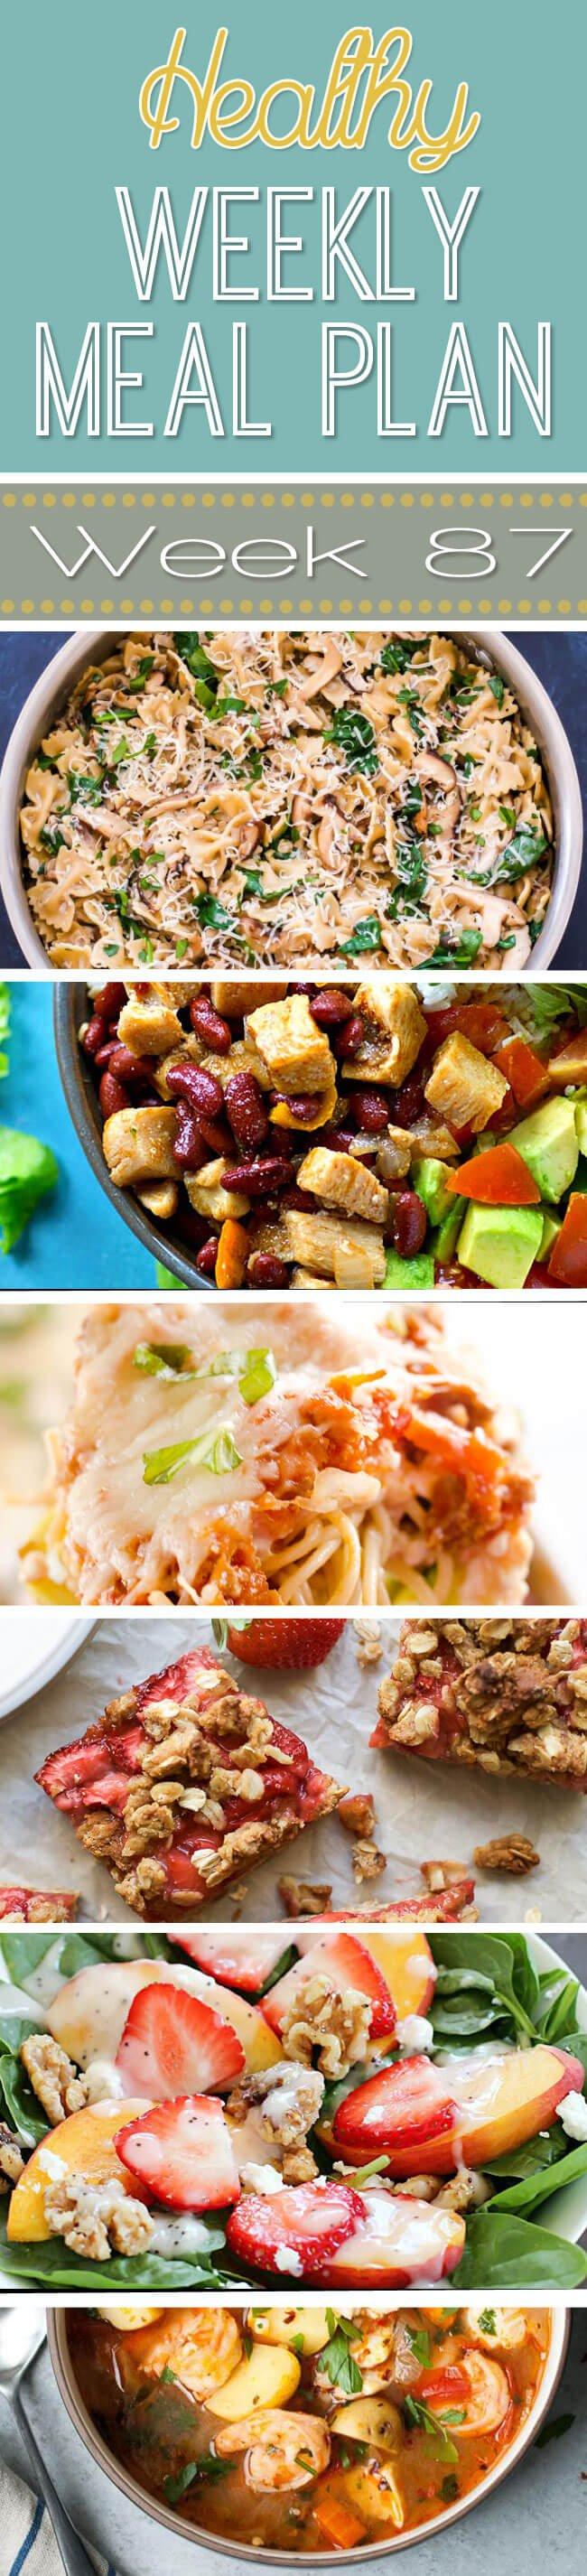 Healthy Weekly Meal Plan #87